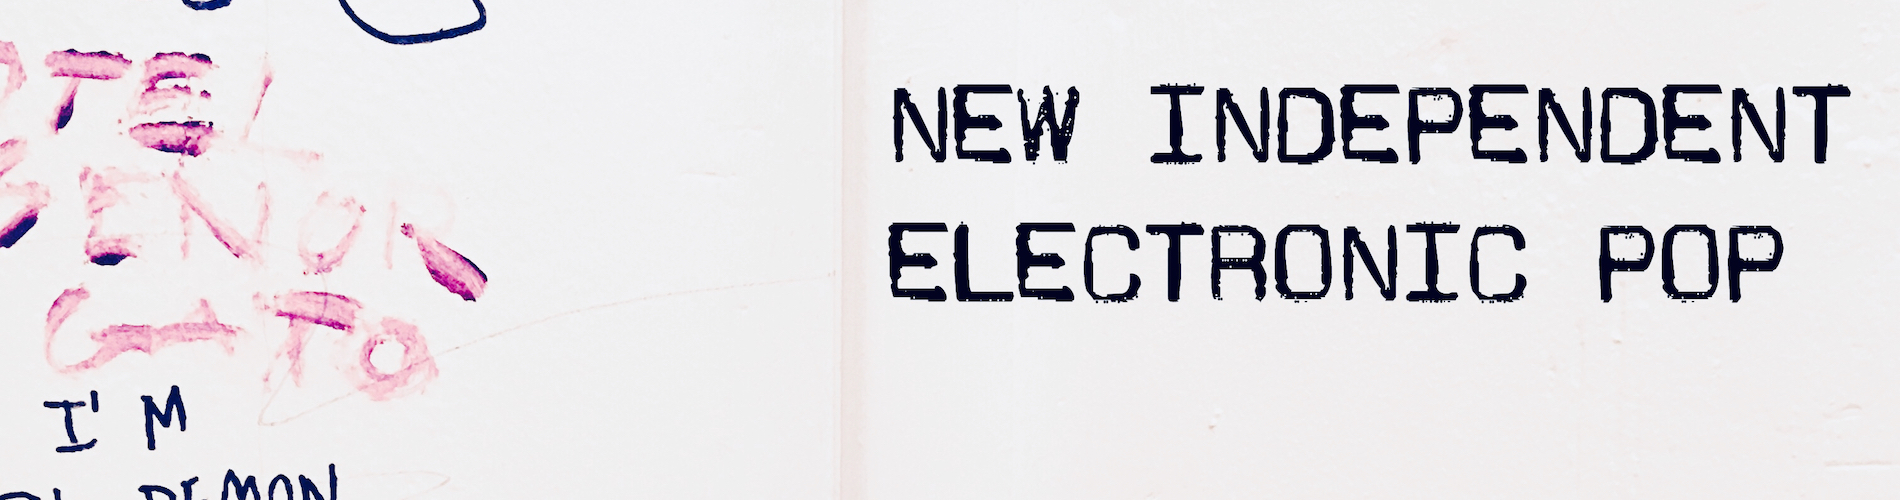 Electronic-Pop-Playlist-Banner